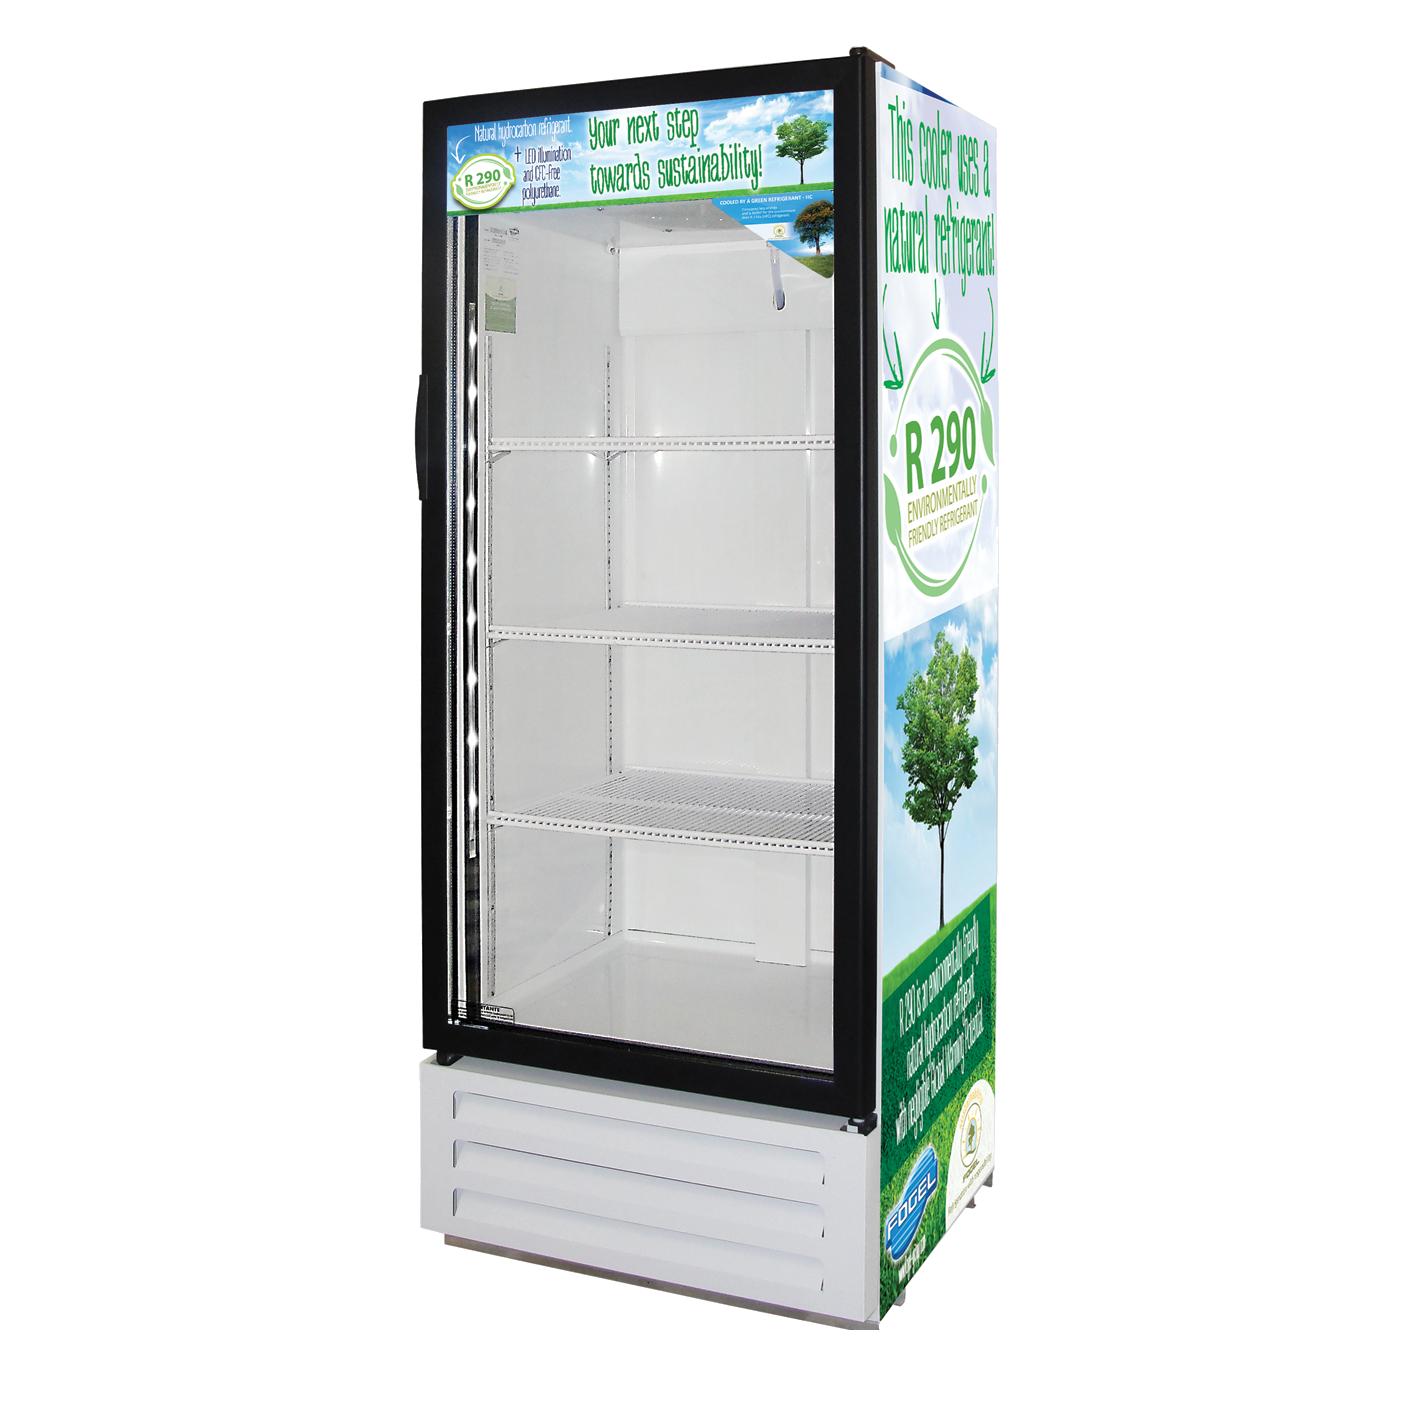 Fogel USA VR-12-HC refrigerator, merchandiser